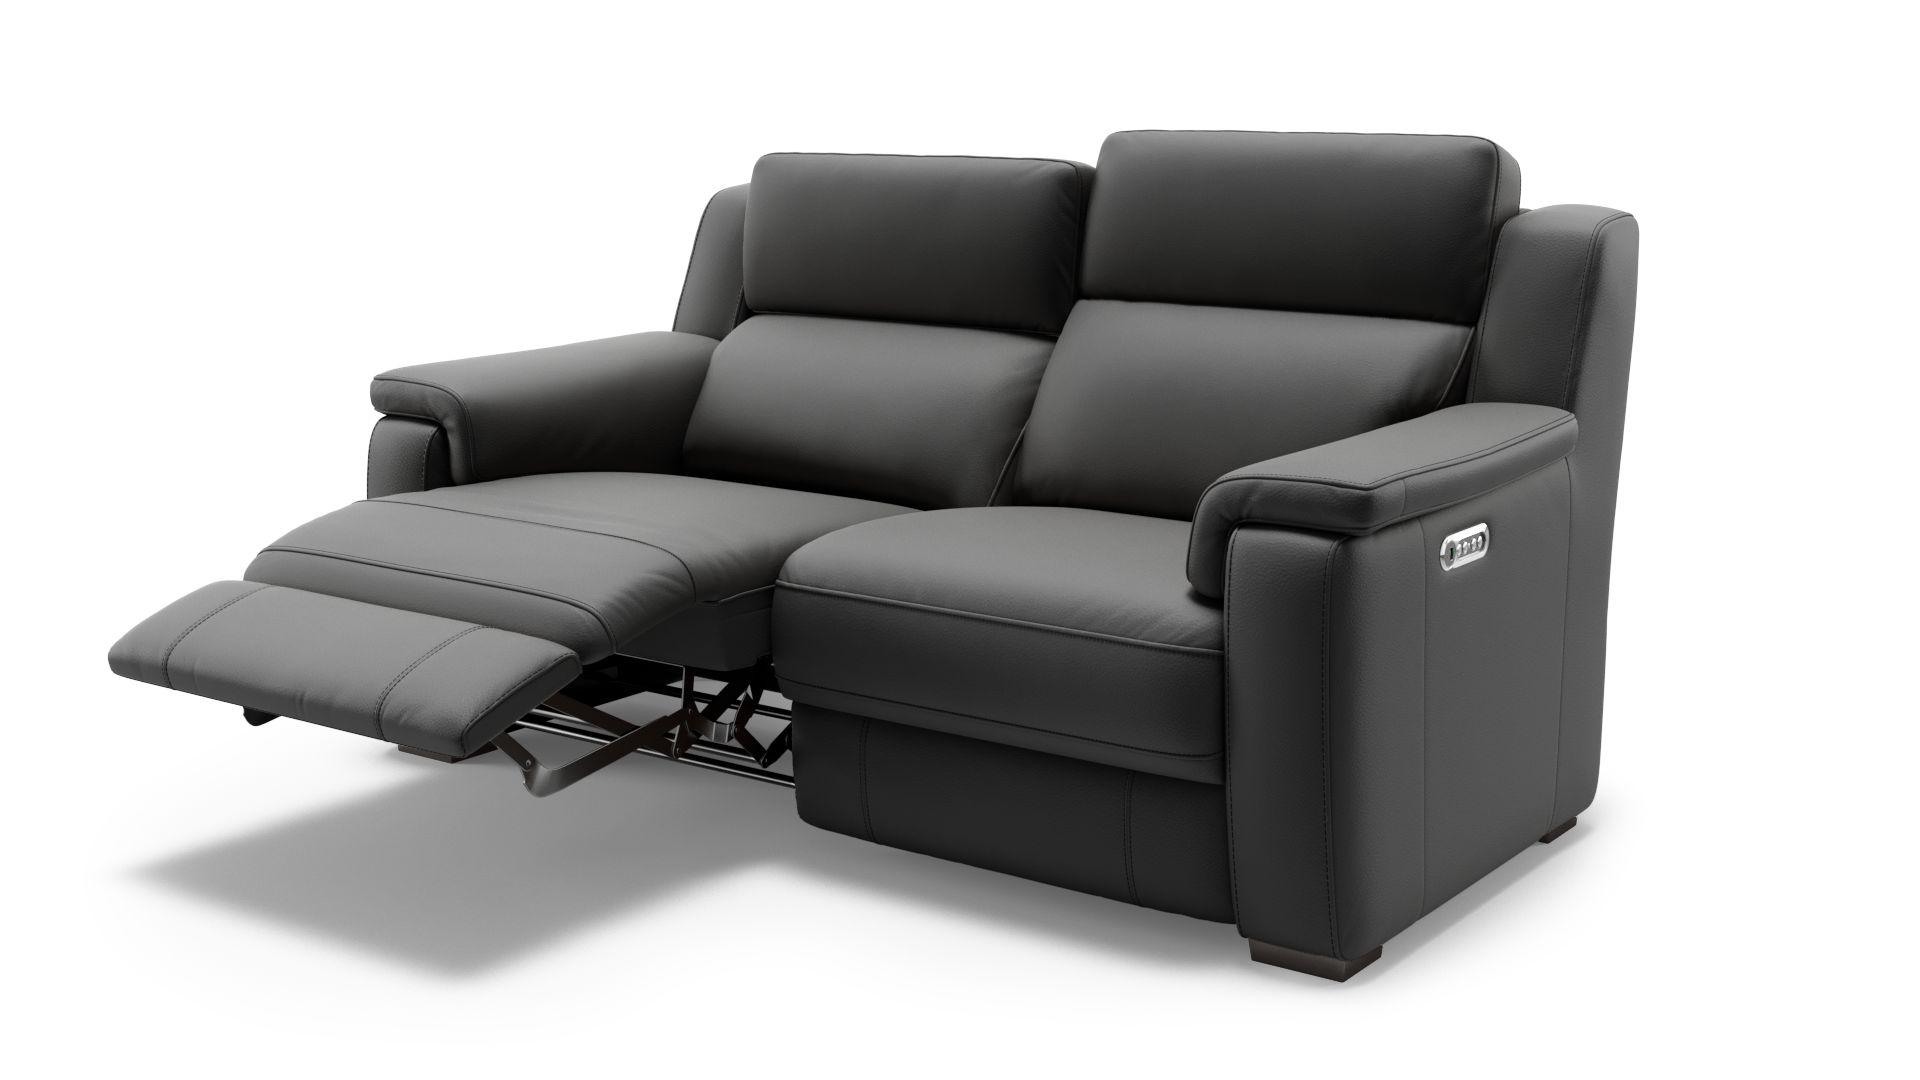 Leder 2-Sitzer Sofa LEVATE